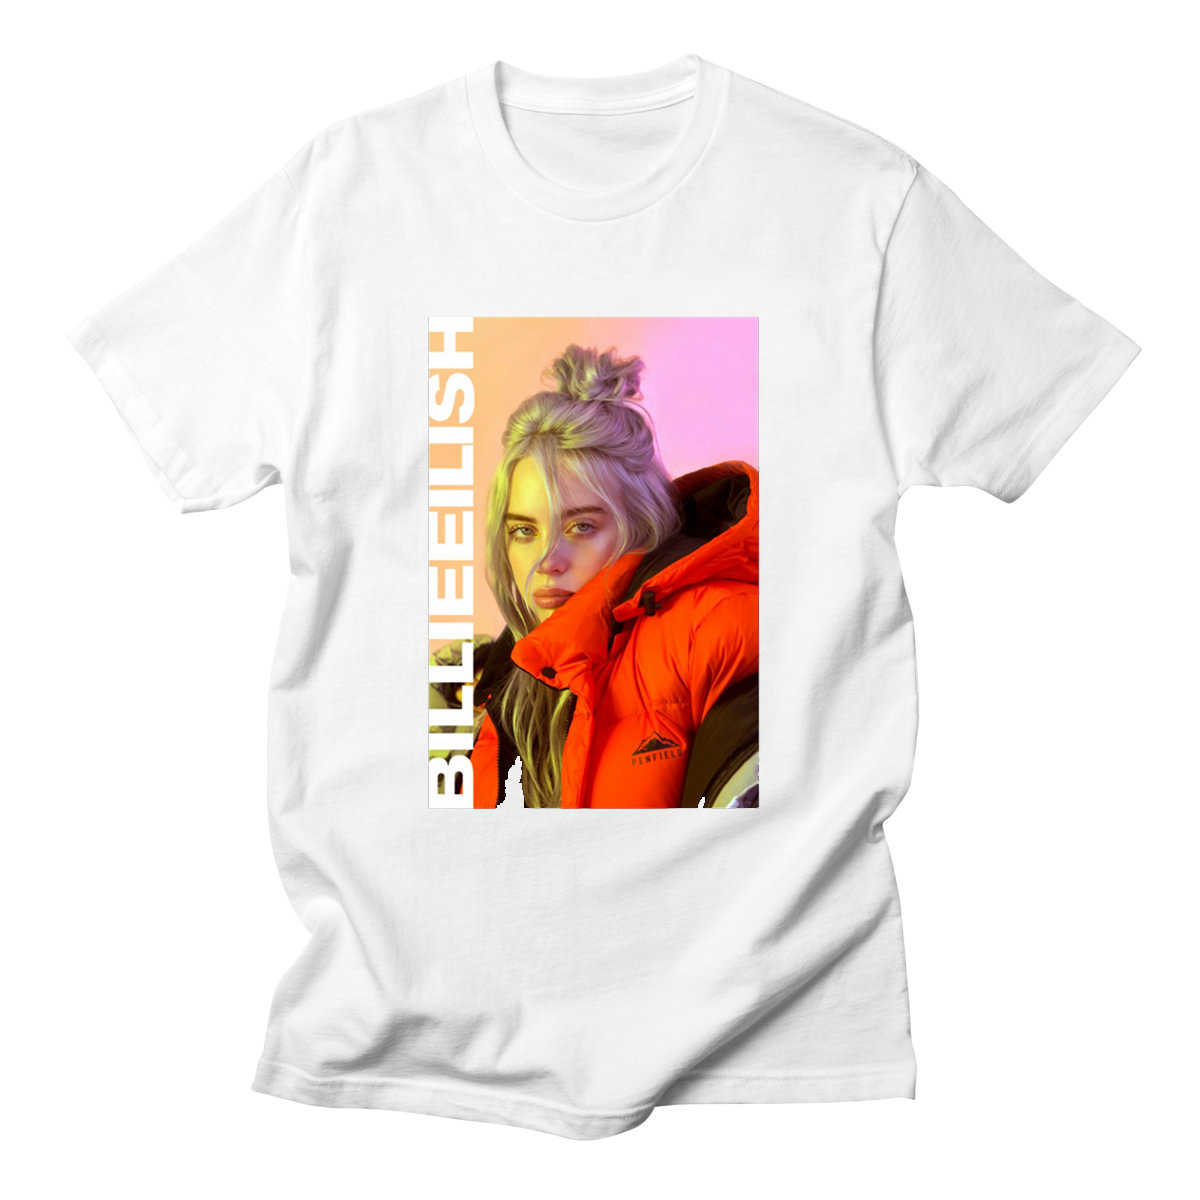 3195d138 LettBao 2019 New Billie Eilish T Shirt Casual Clothes Cotton Harajuku  Crewneck Big Size Short Sleeve